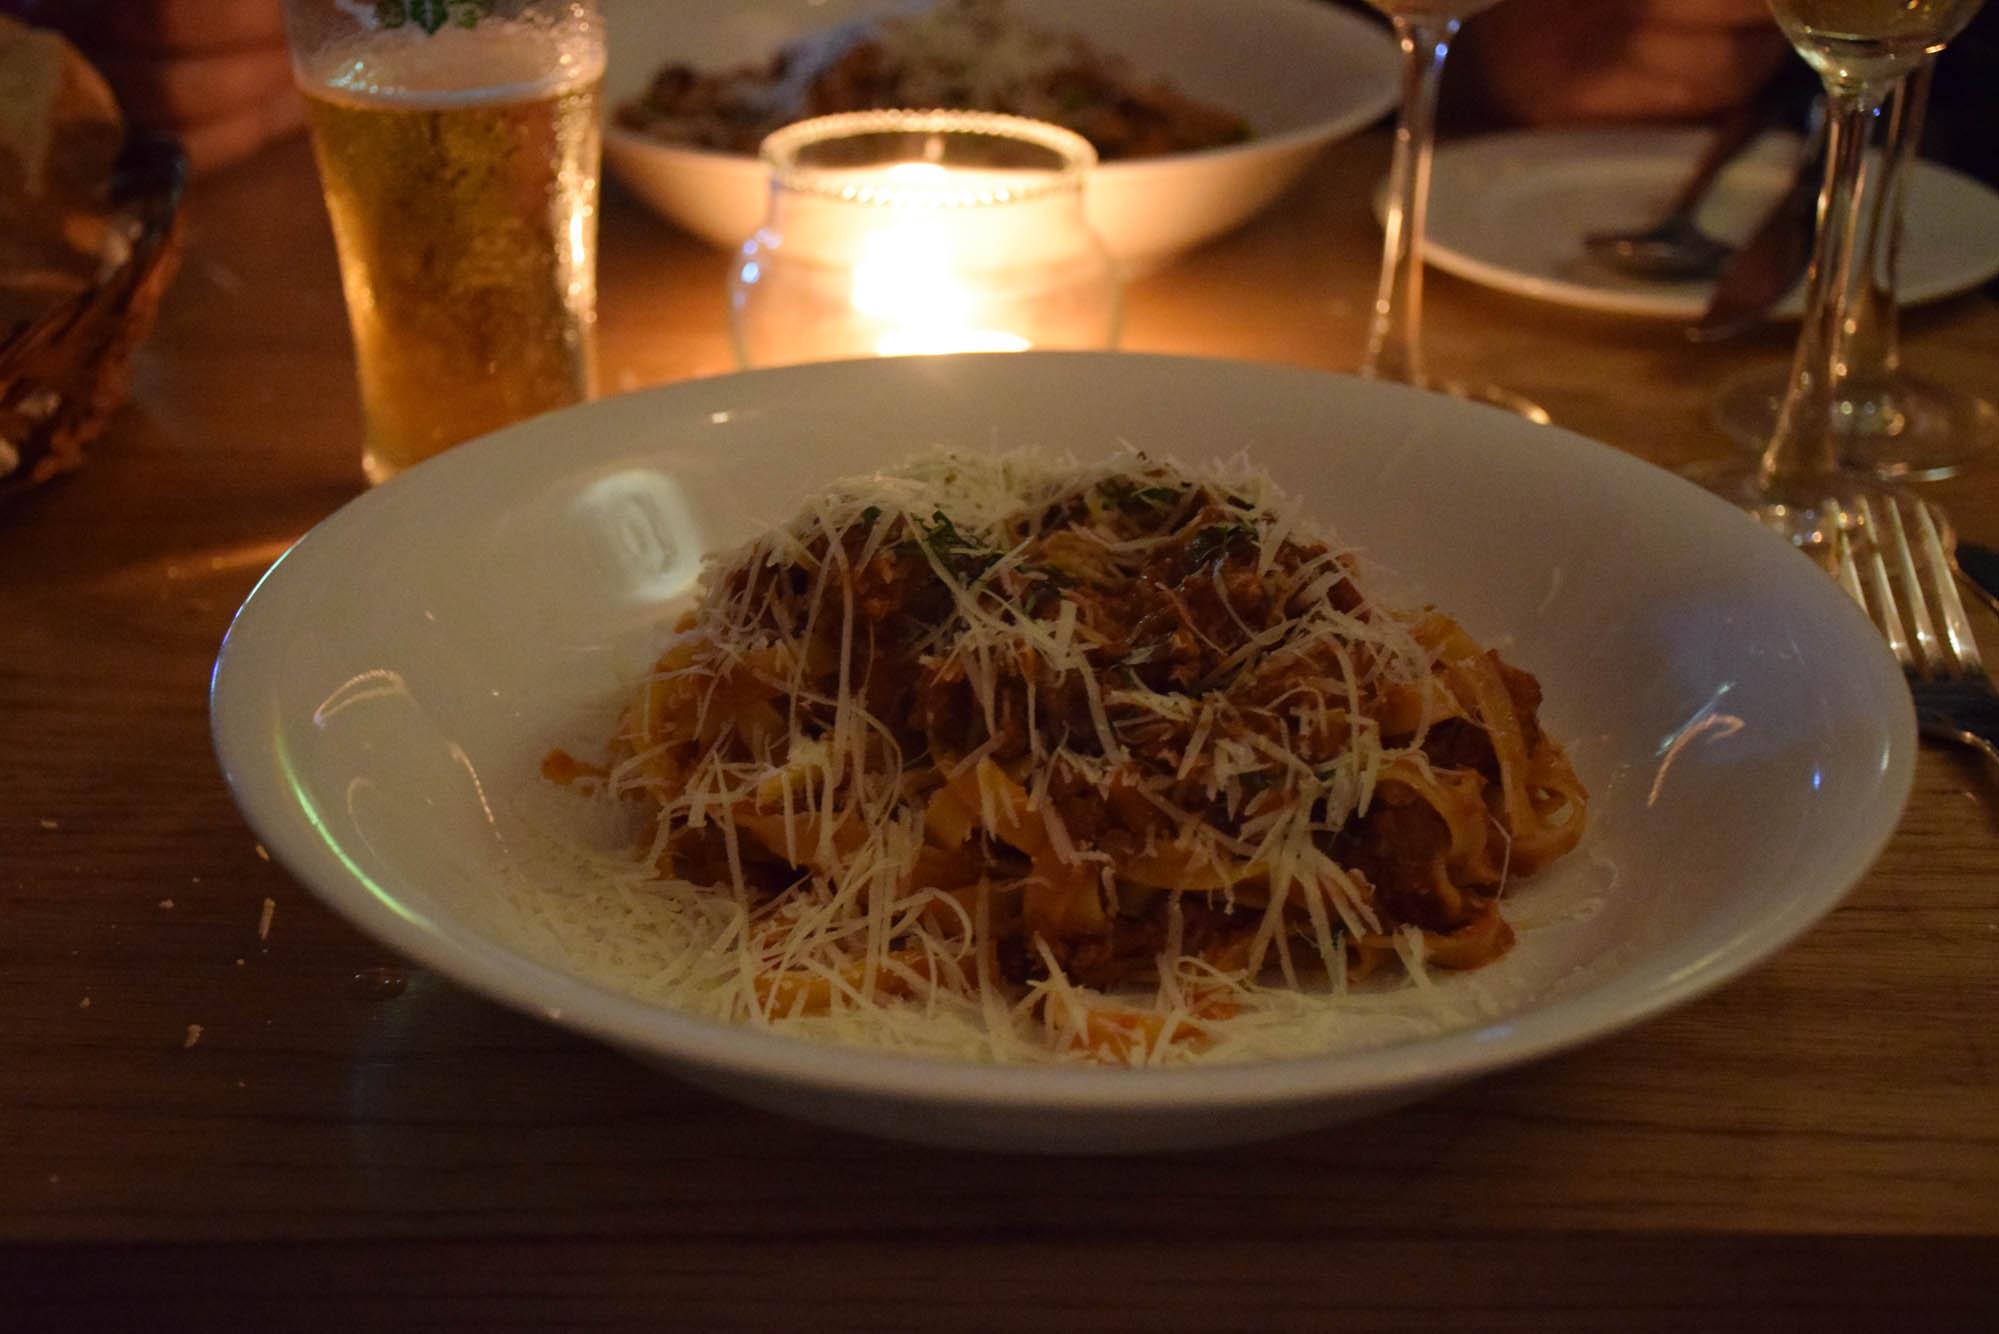 ciao-bella-italian-restaurant-ho-chi-minh-city-saigon-vietnam-best-restaurants-melhores-restaurantes